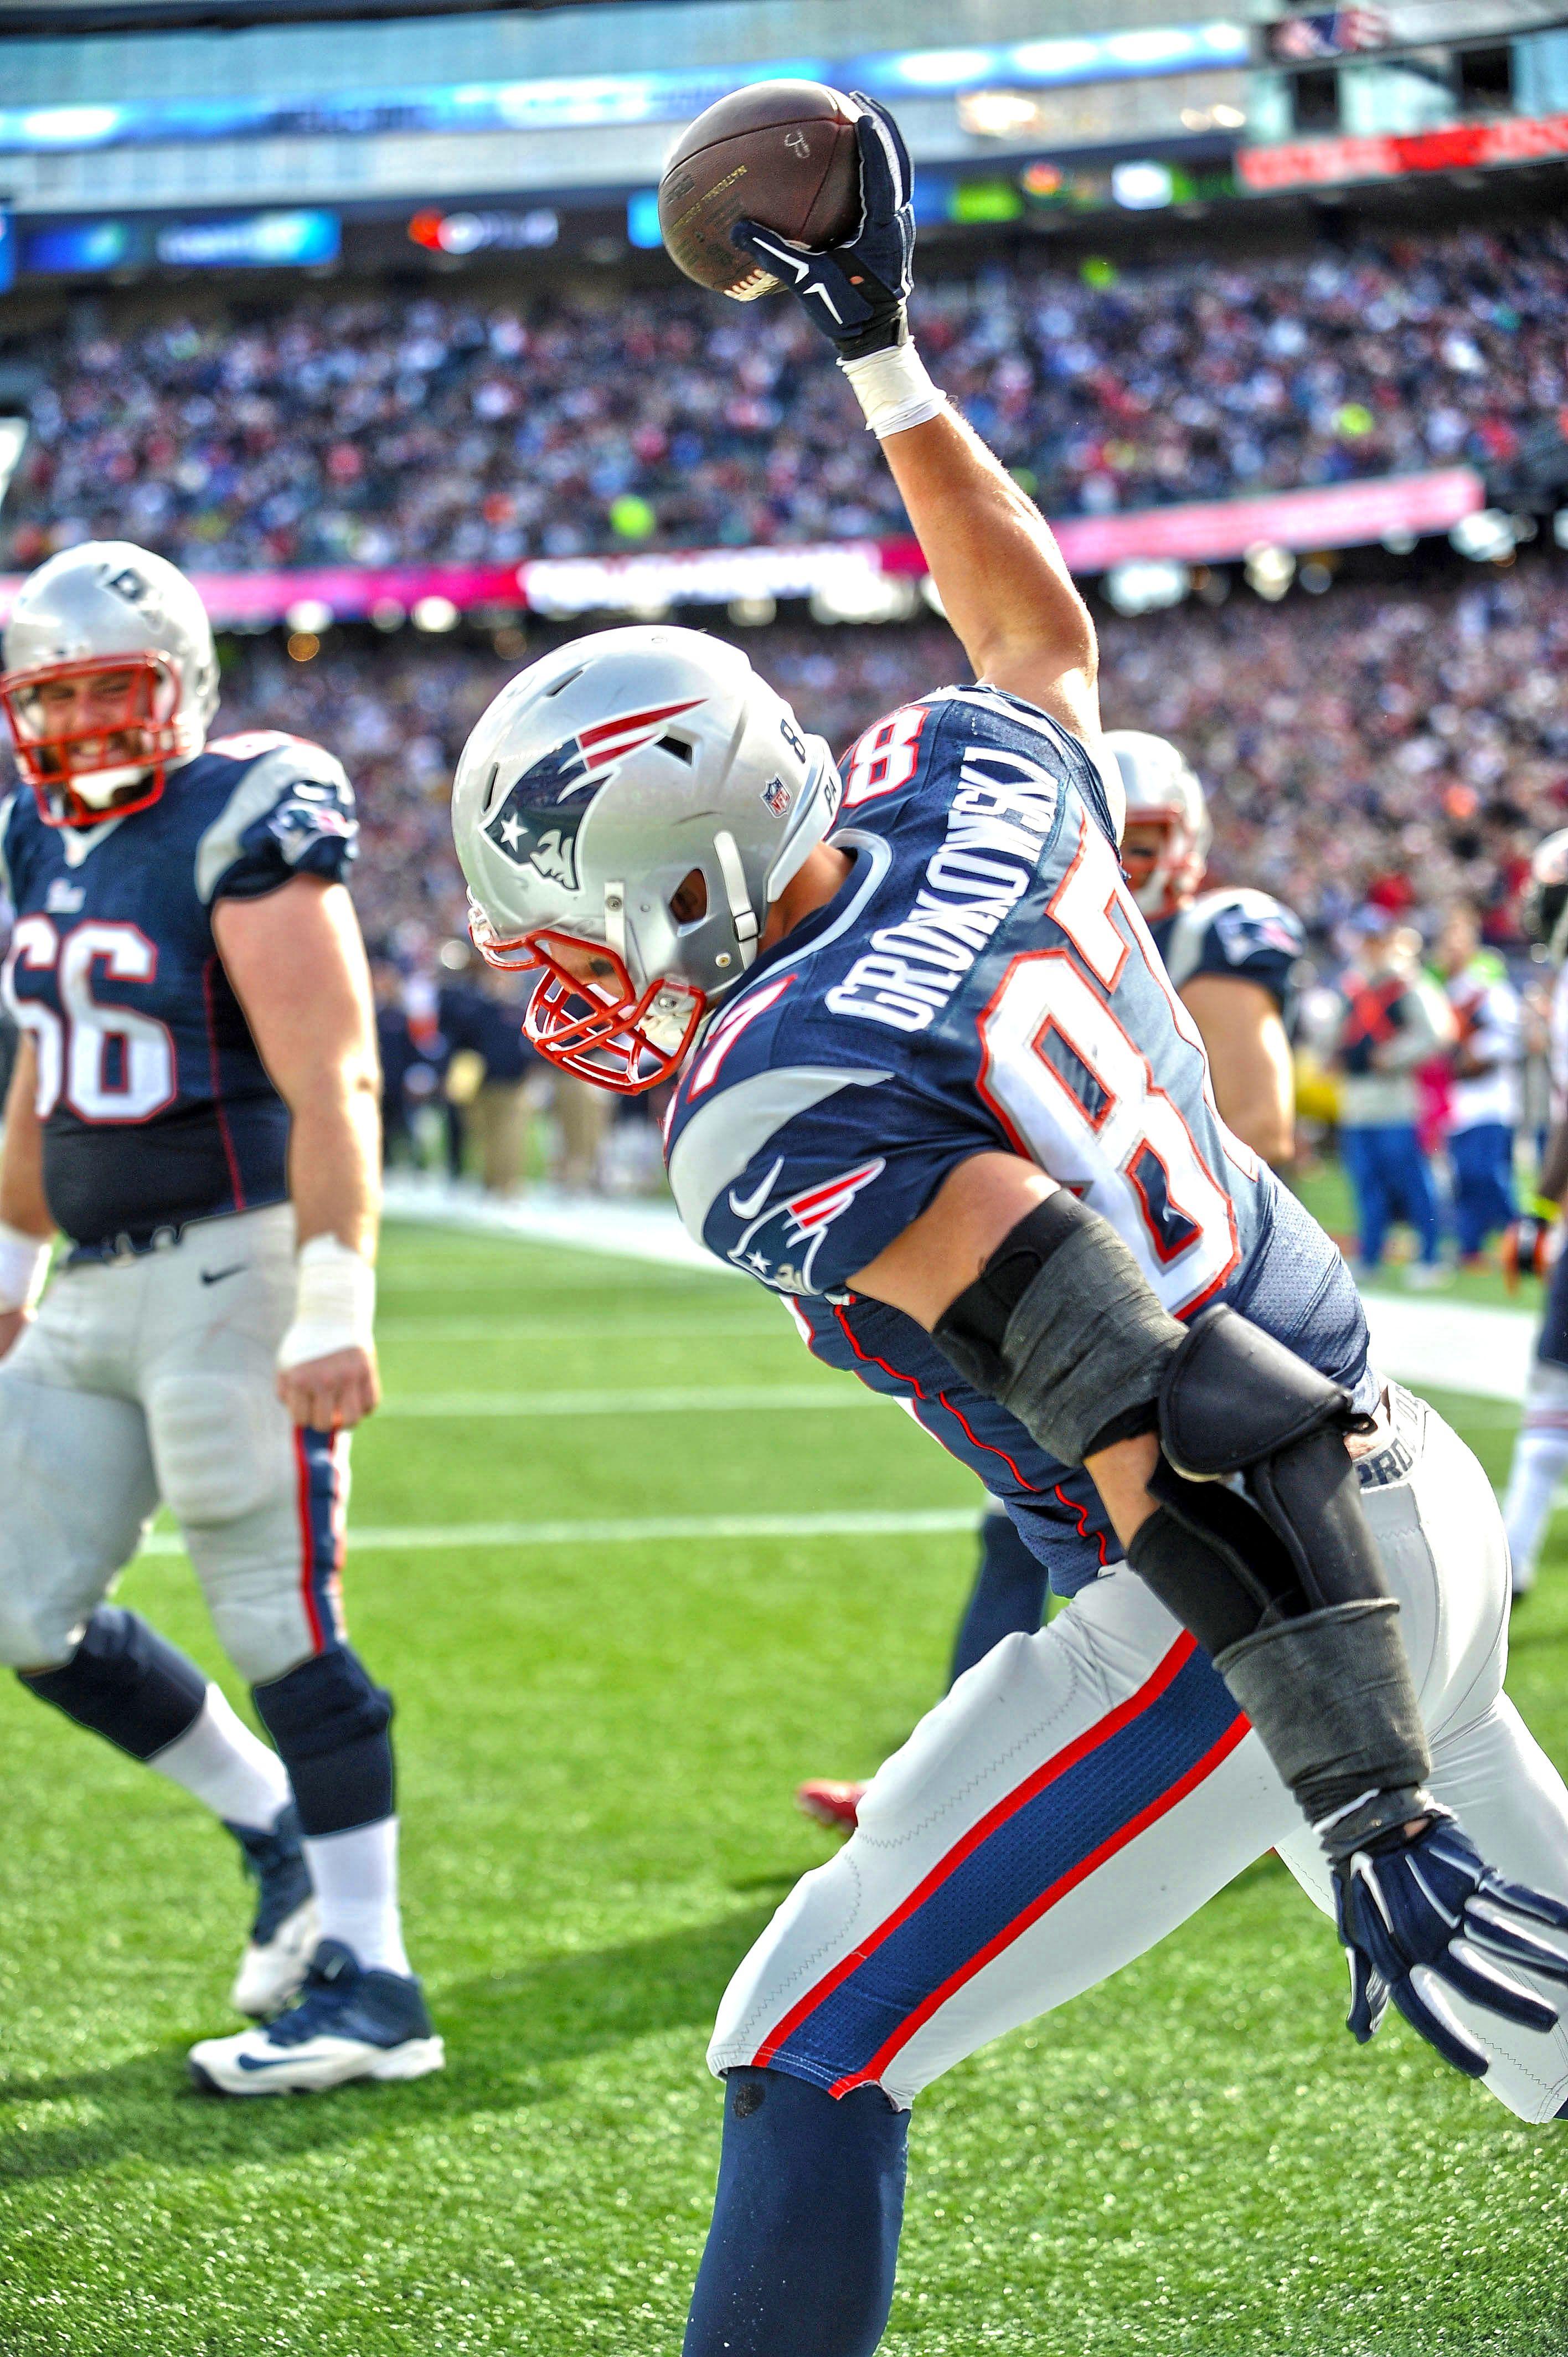 Gronk Spike New England Patriots Gronkowski New England Patriots Football